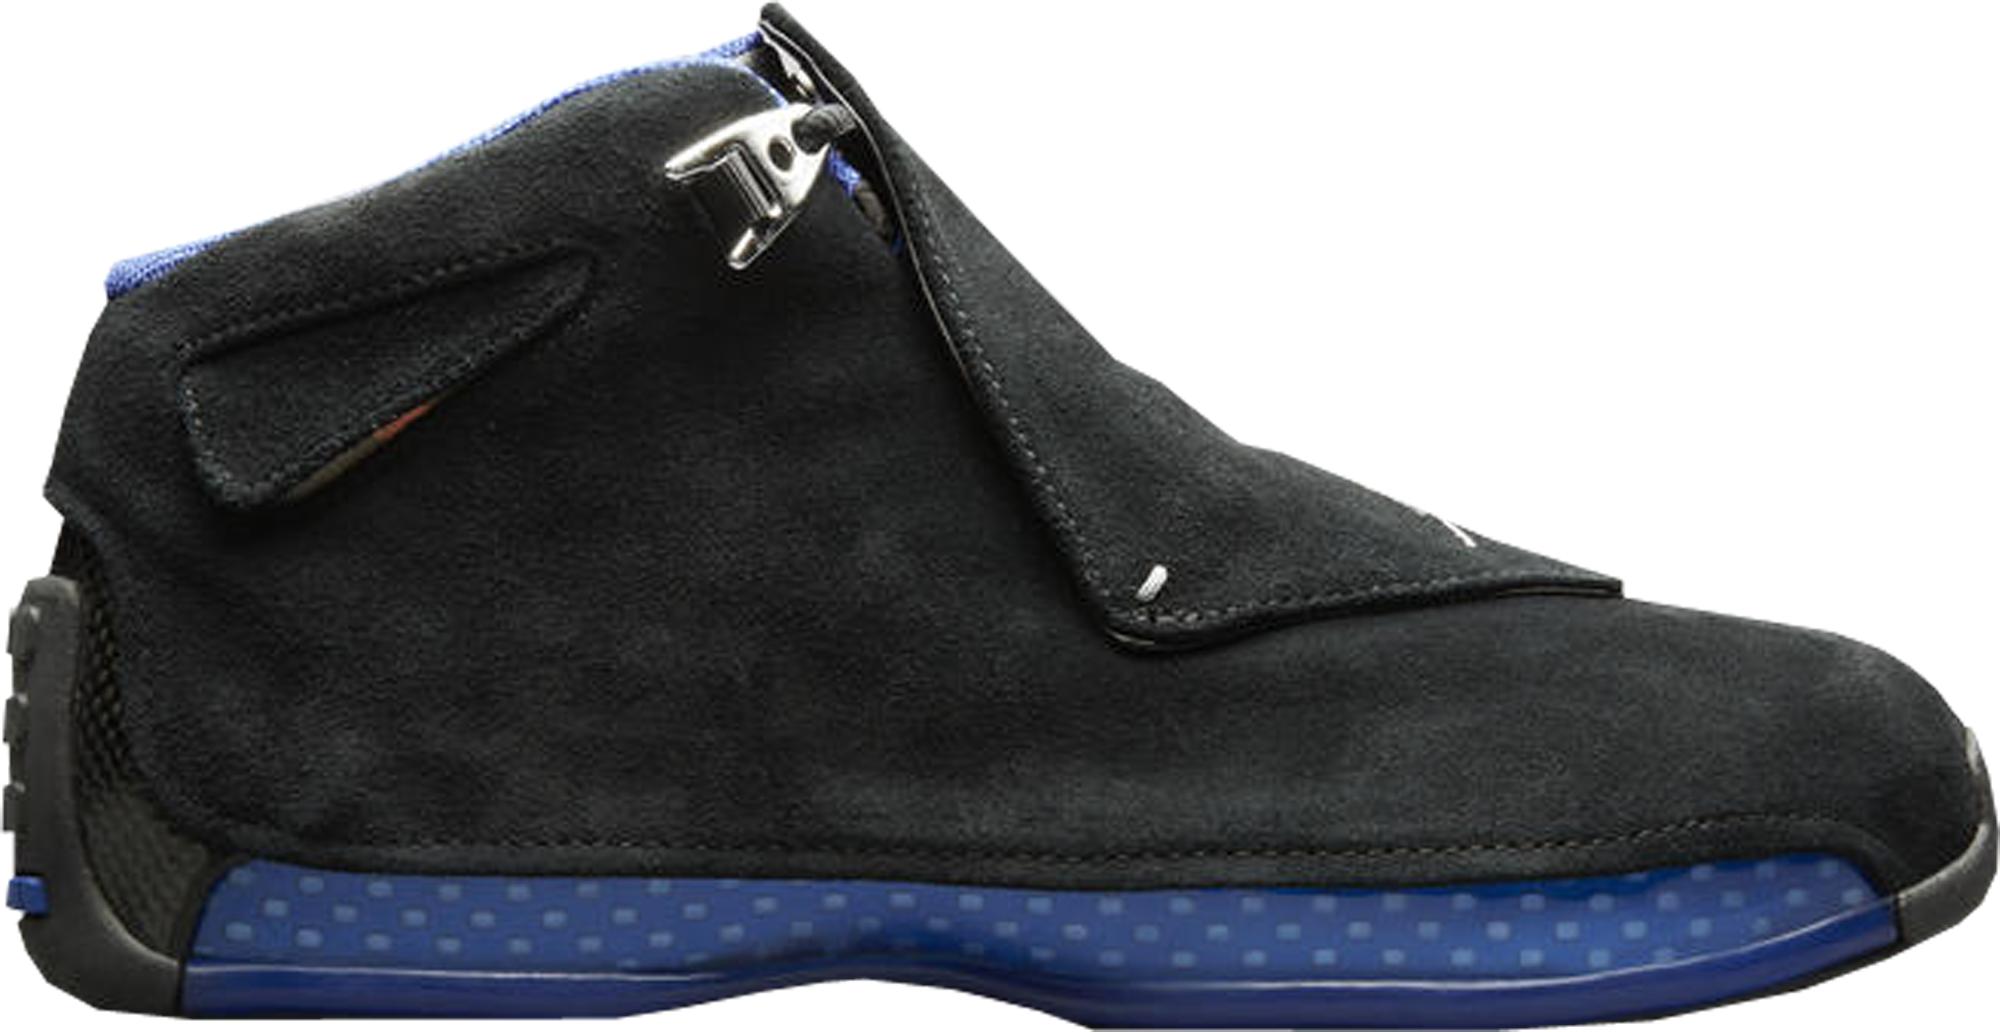 Jordan 18 Retro Black Sport Royal